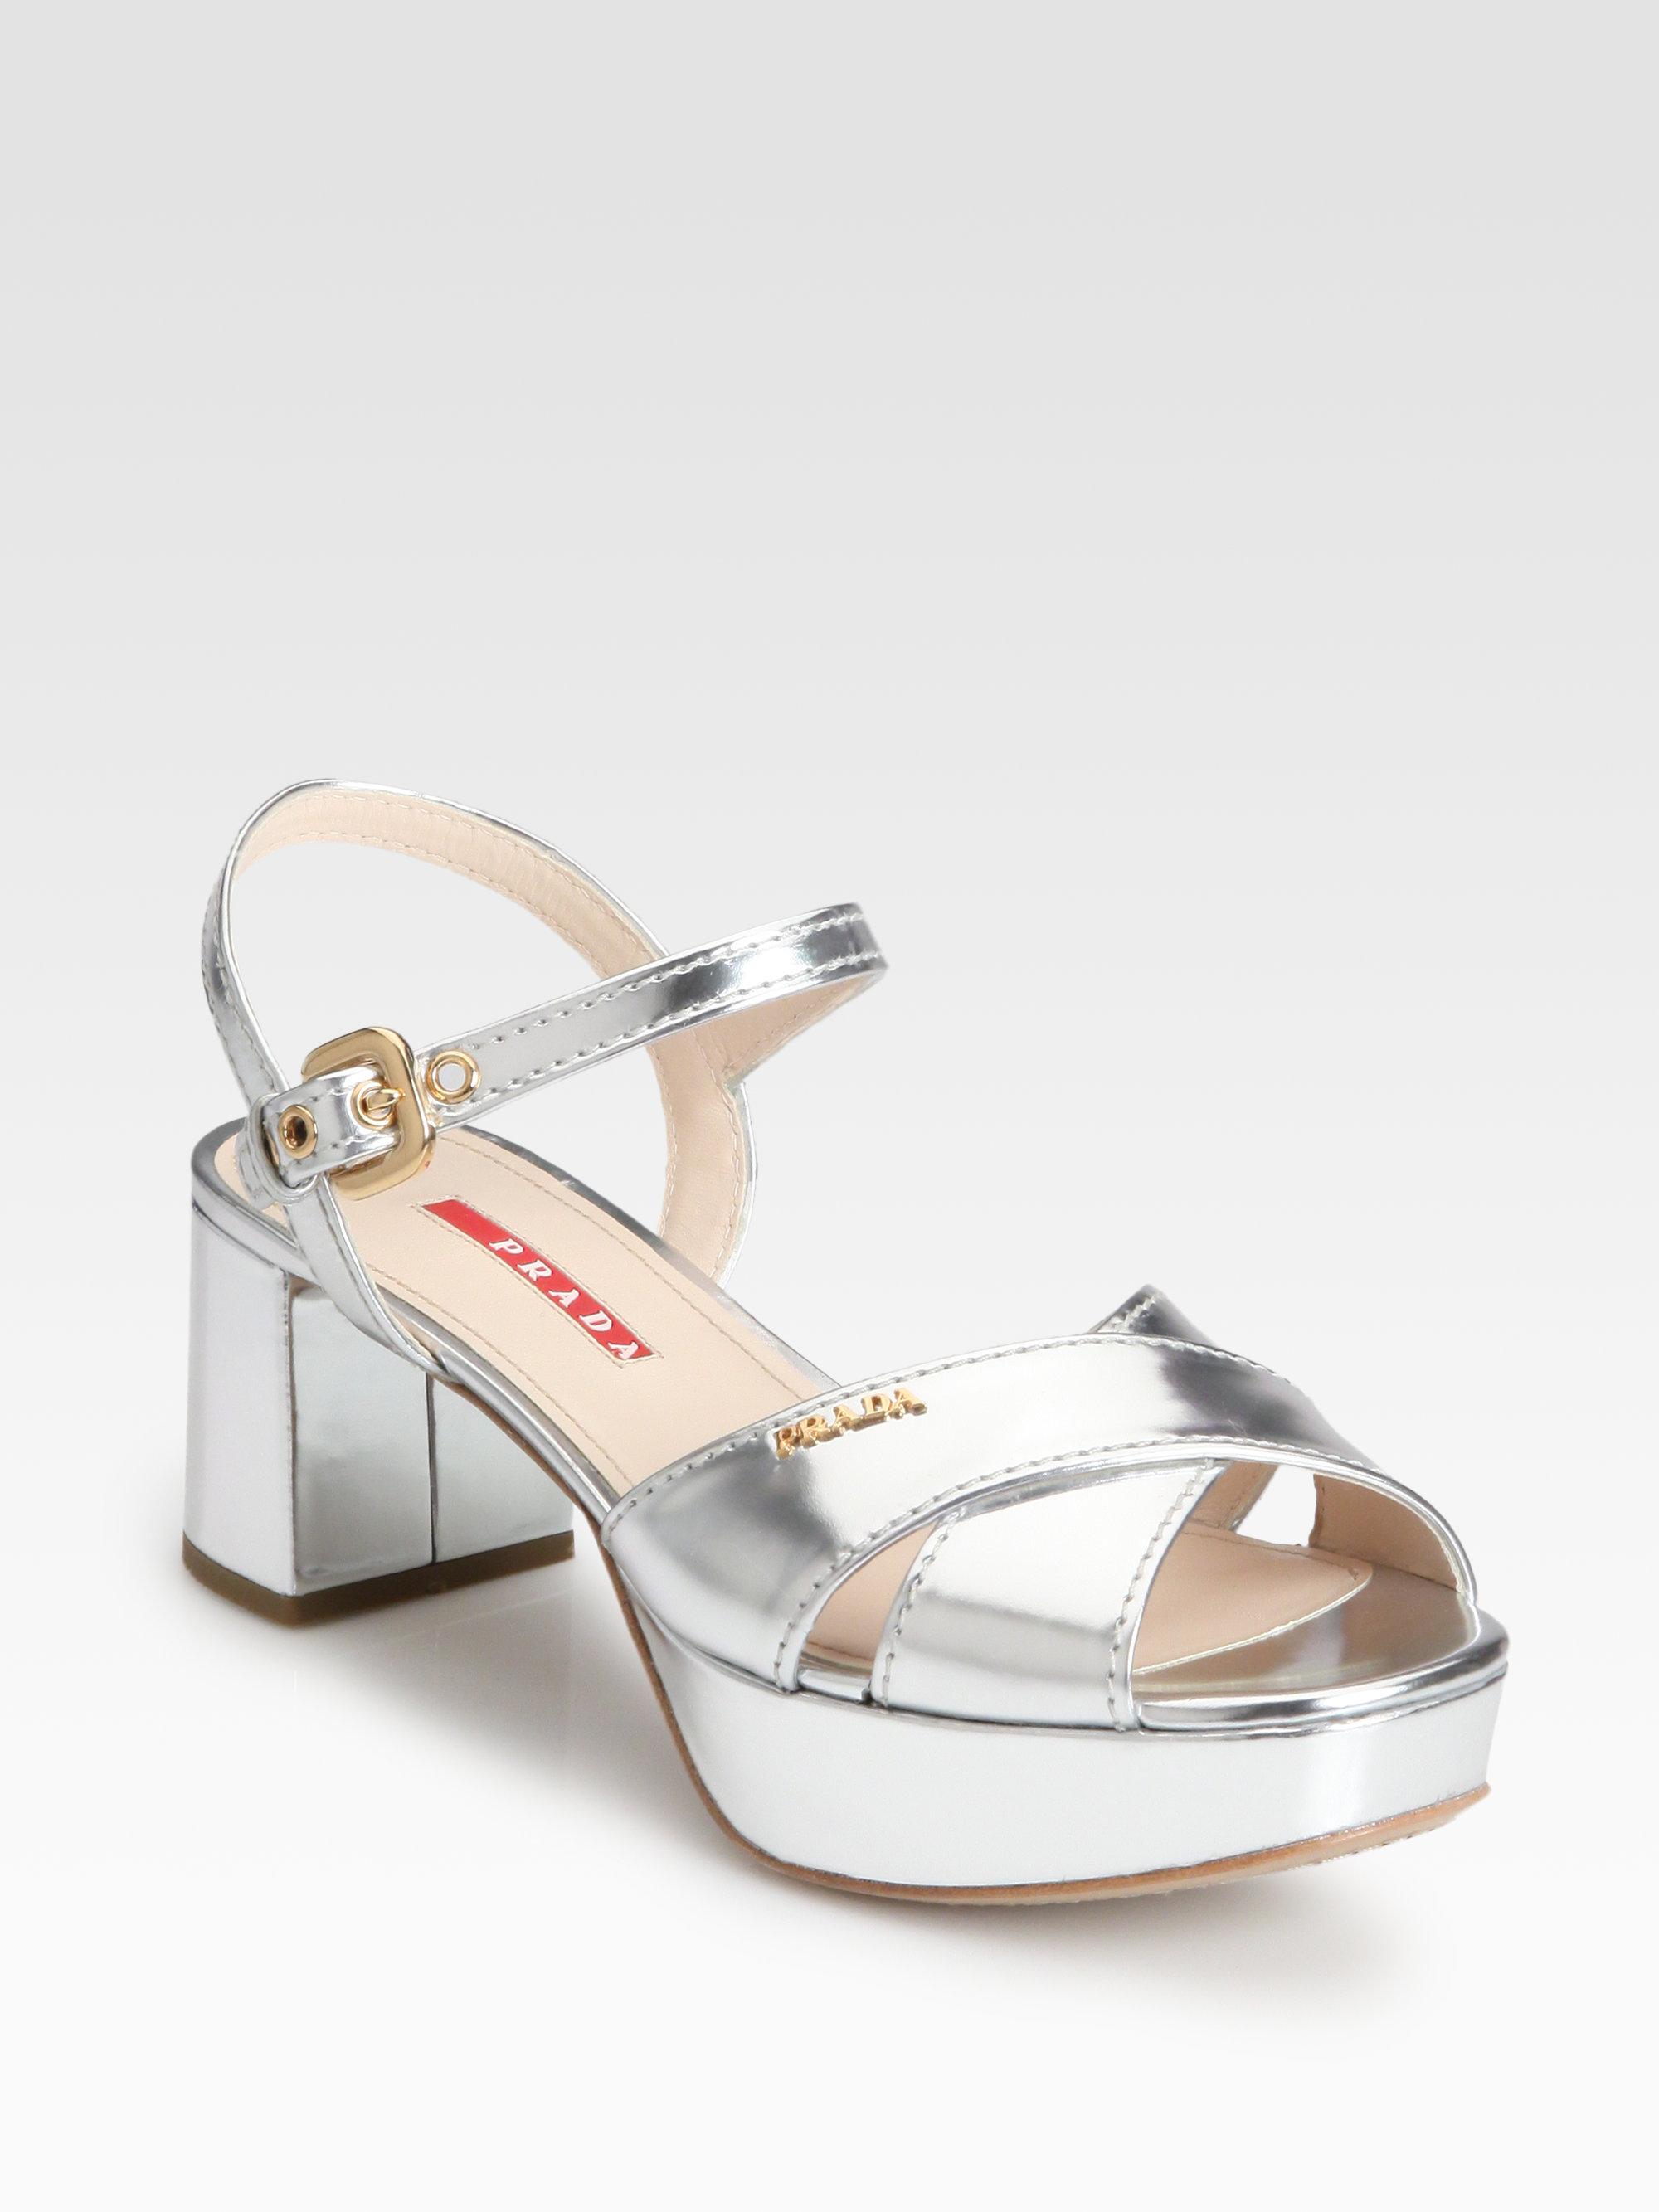 d5f6cd9295c4 Lyst - Prada Metallic Leather Crisscross Platform Sandals in Metallic